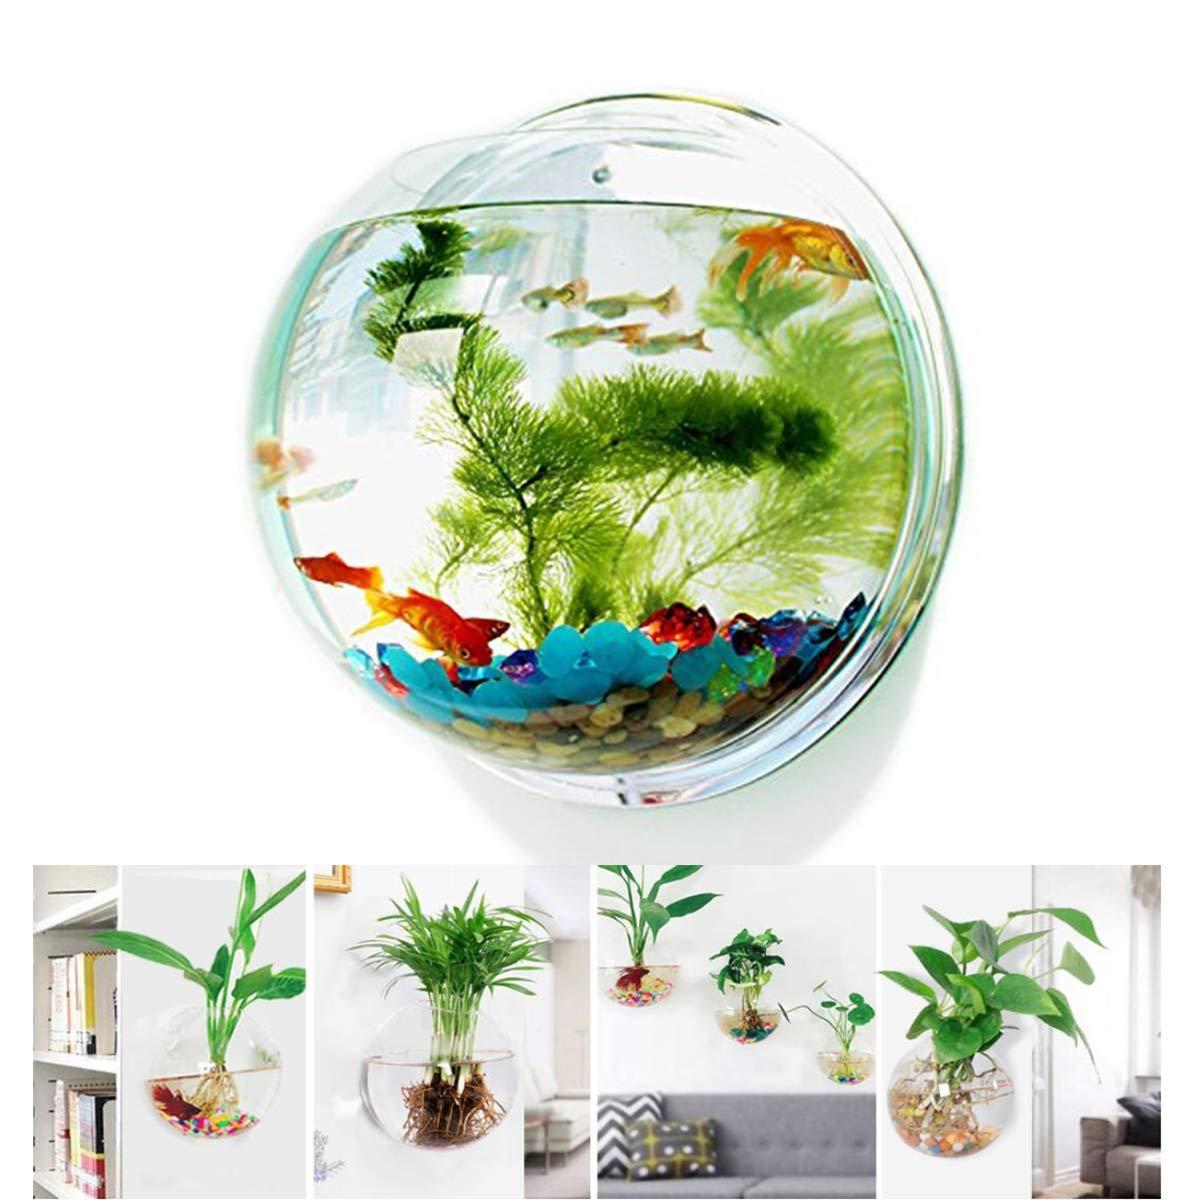 WXJHA Wall-Hanging Fish Bowl,Acrylic Background Pot Bubble Aquarium Bowl Fish Tank,Gallon Fish Tank Home Decoration by WXJHA